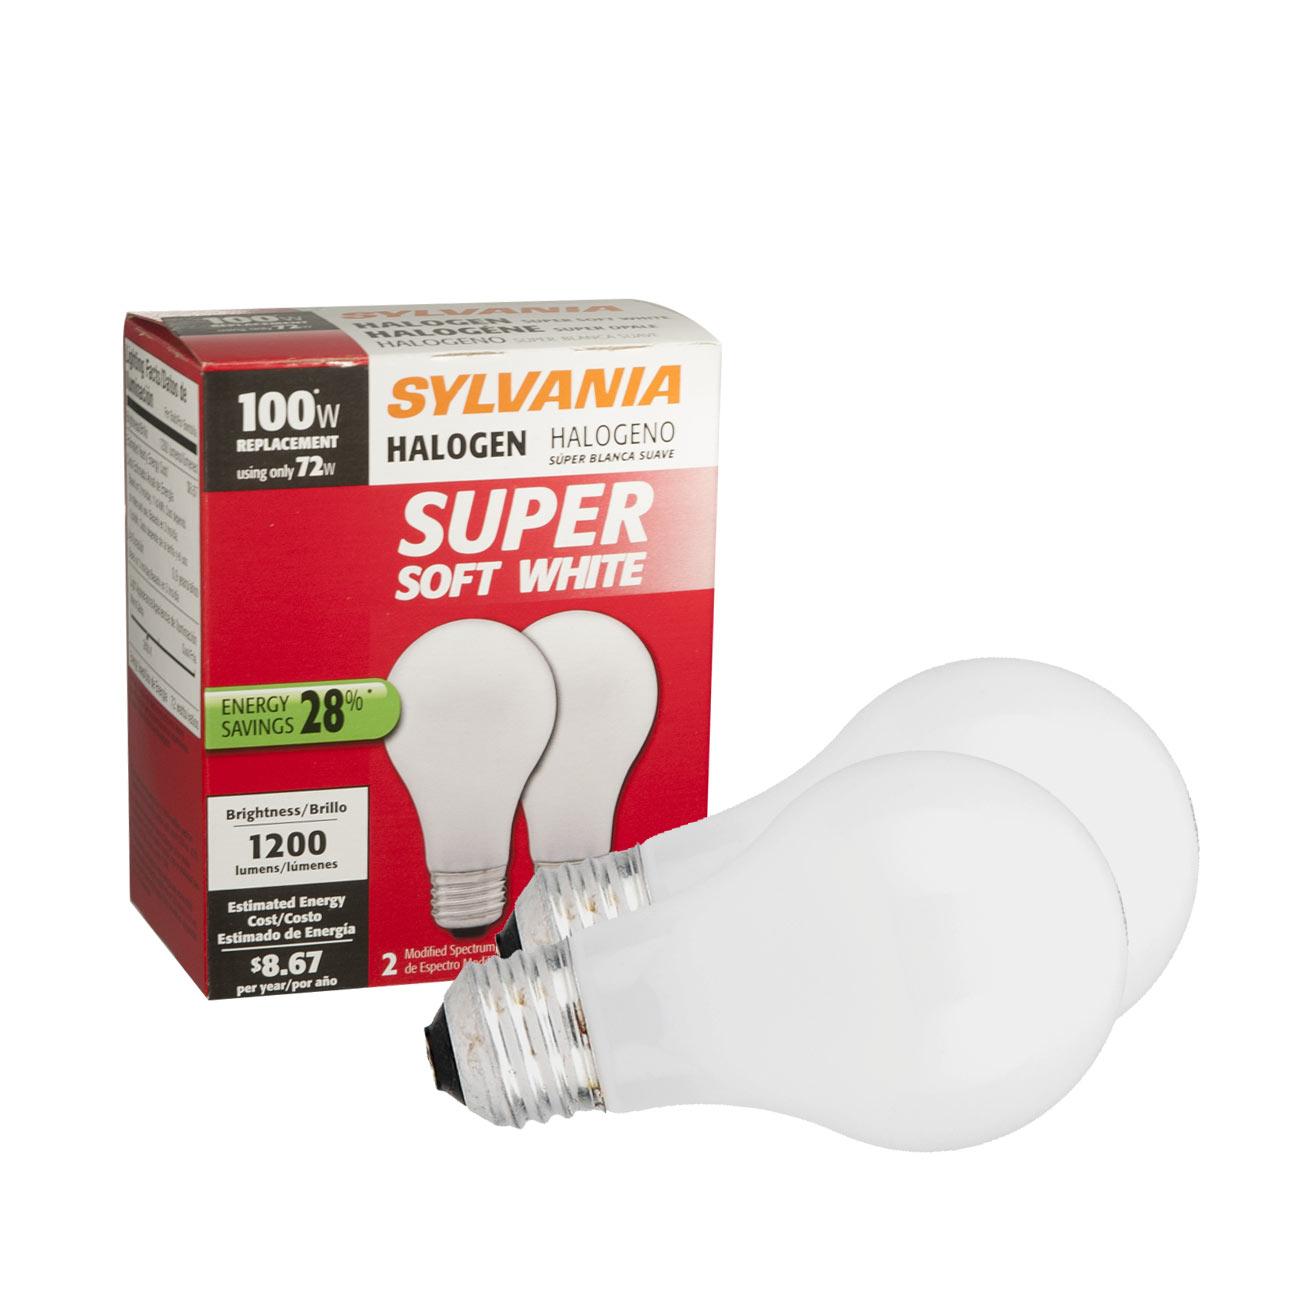 Sylvania Halogen Light Bulb - 2 Pak